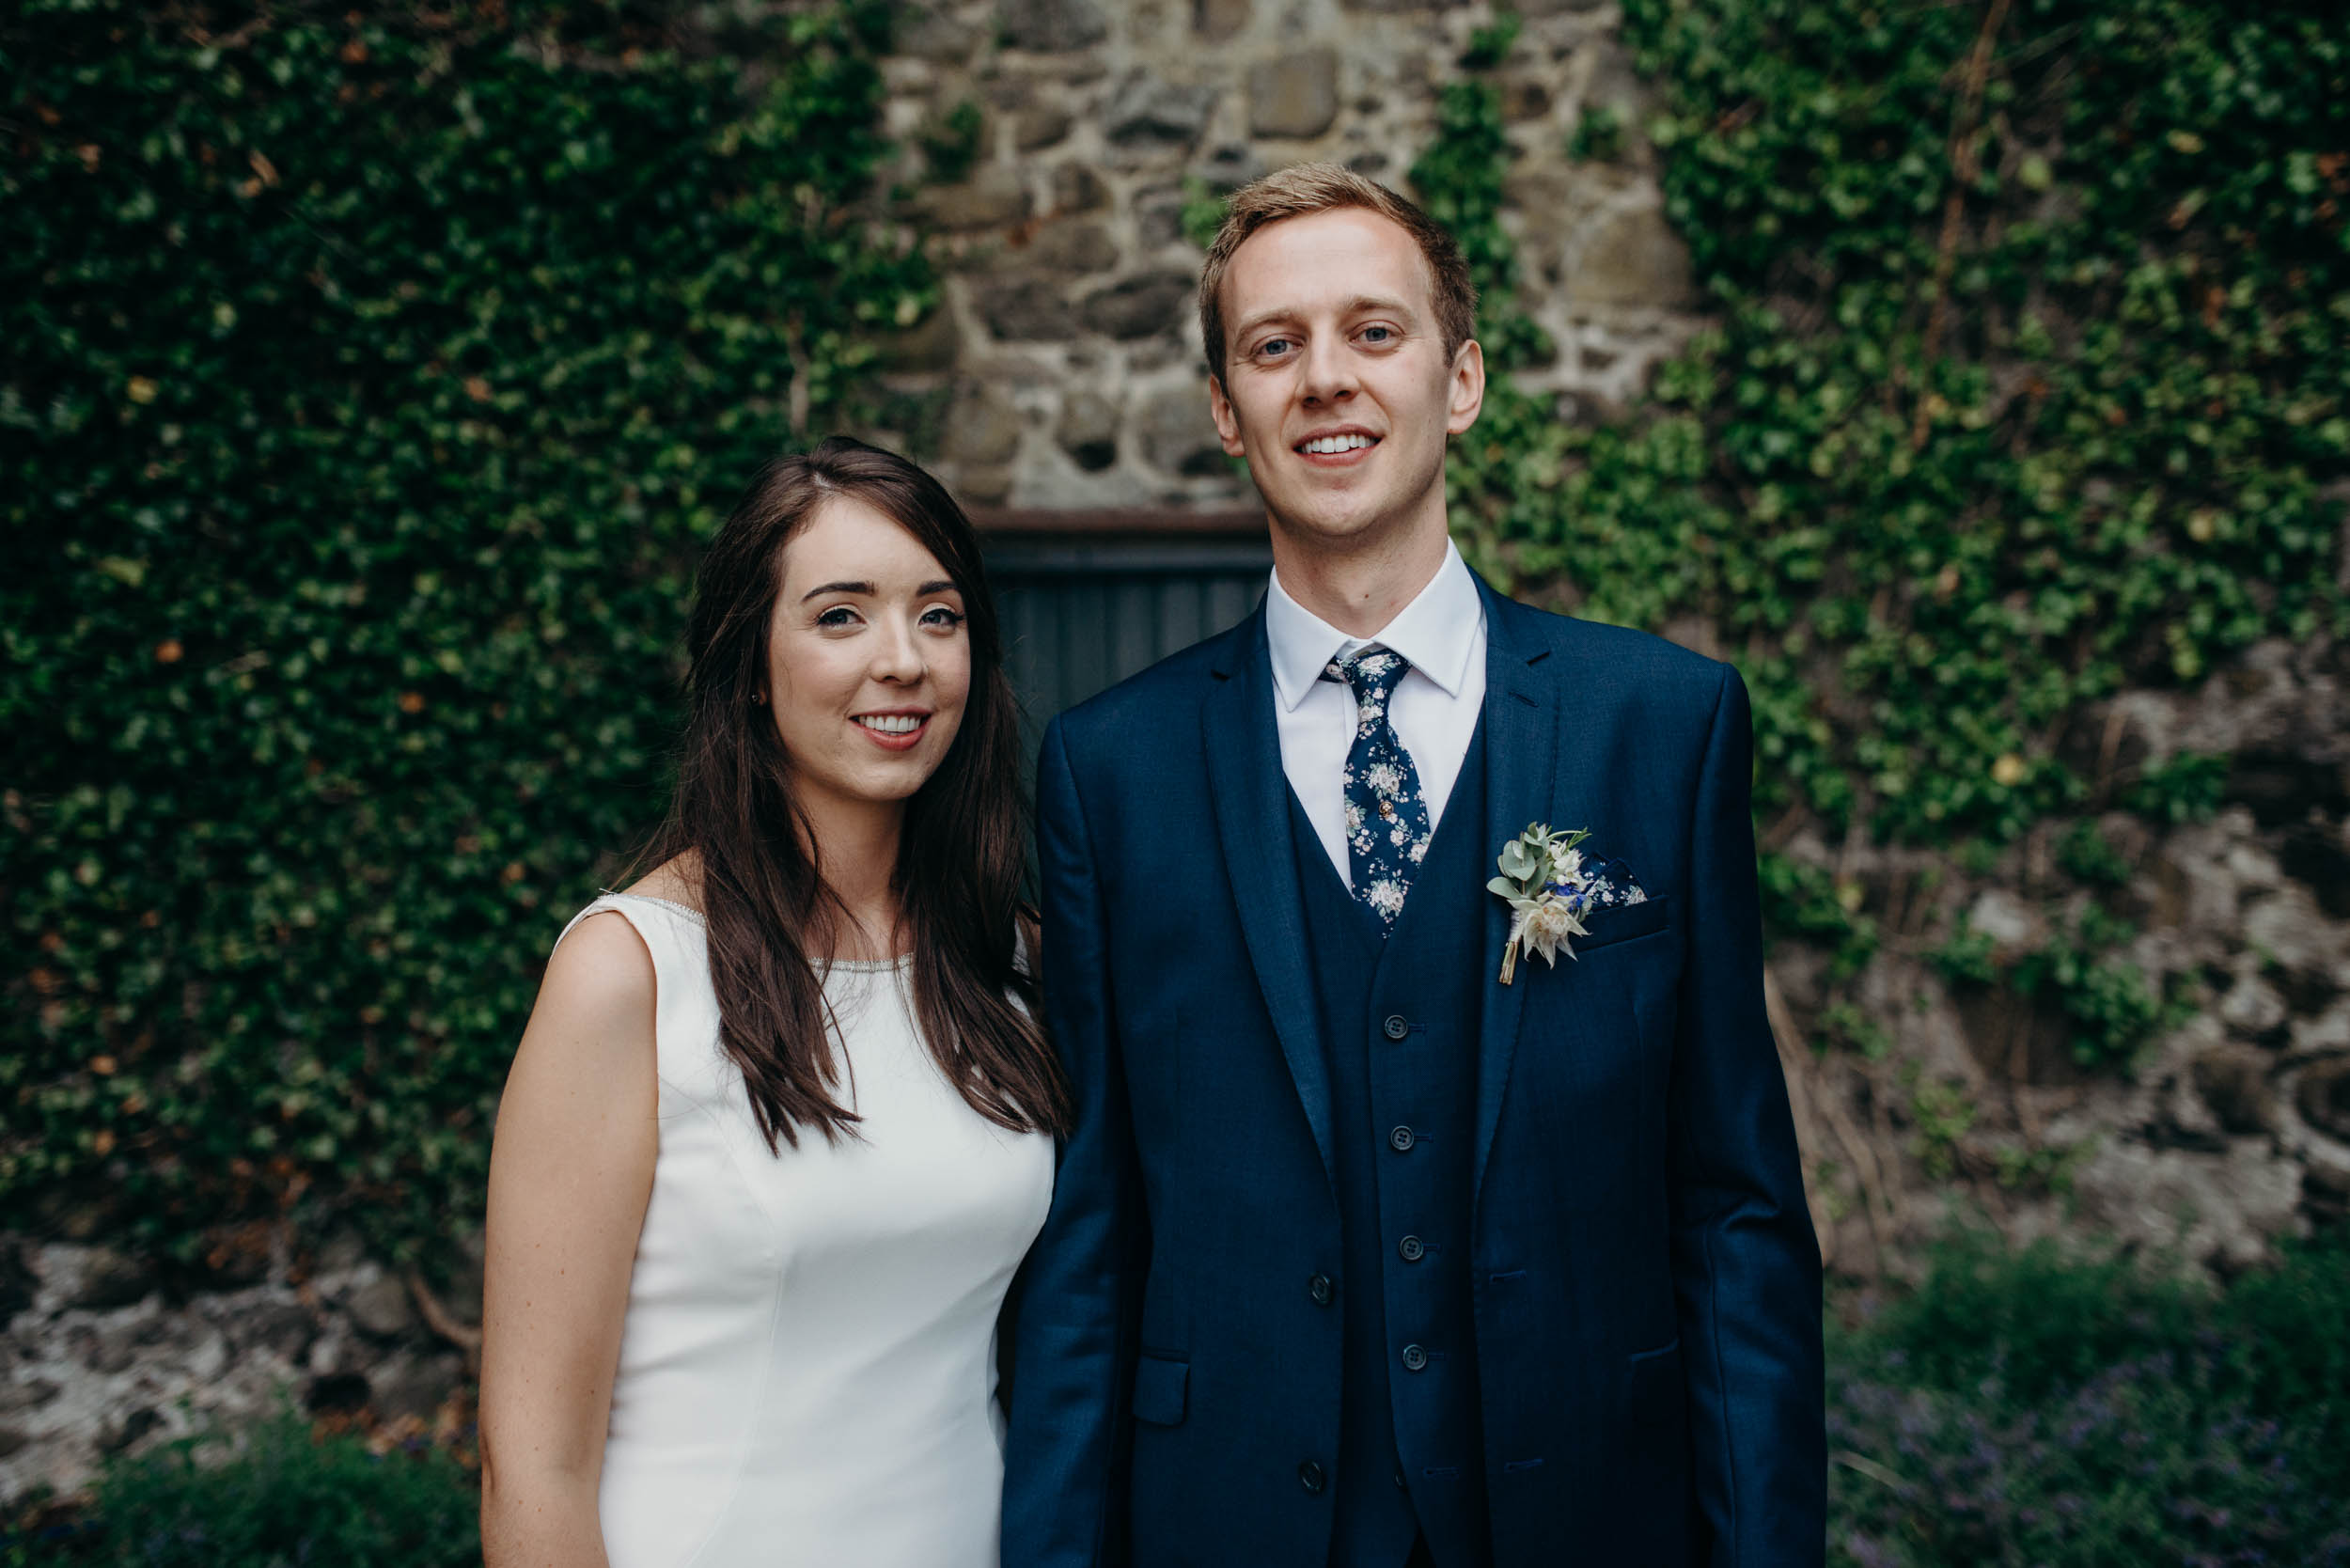 ivory pavillion wedding northern ireland-158.jpg